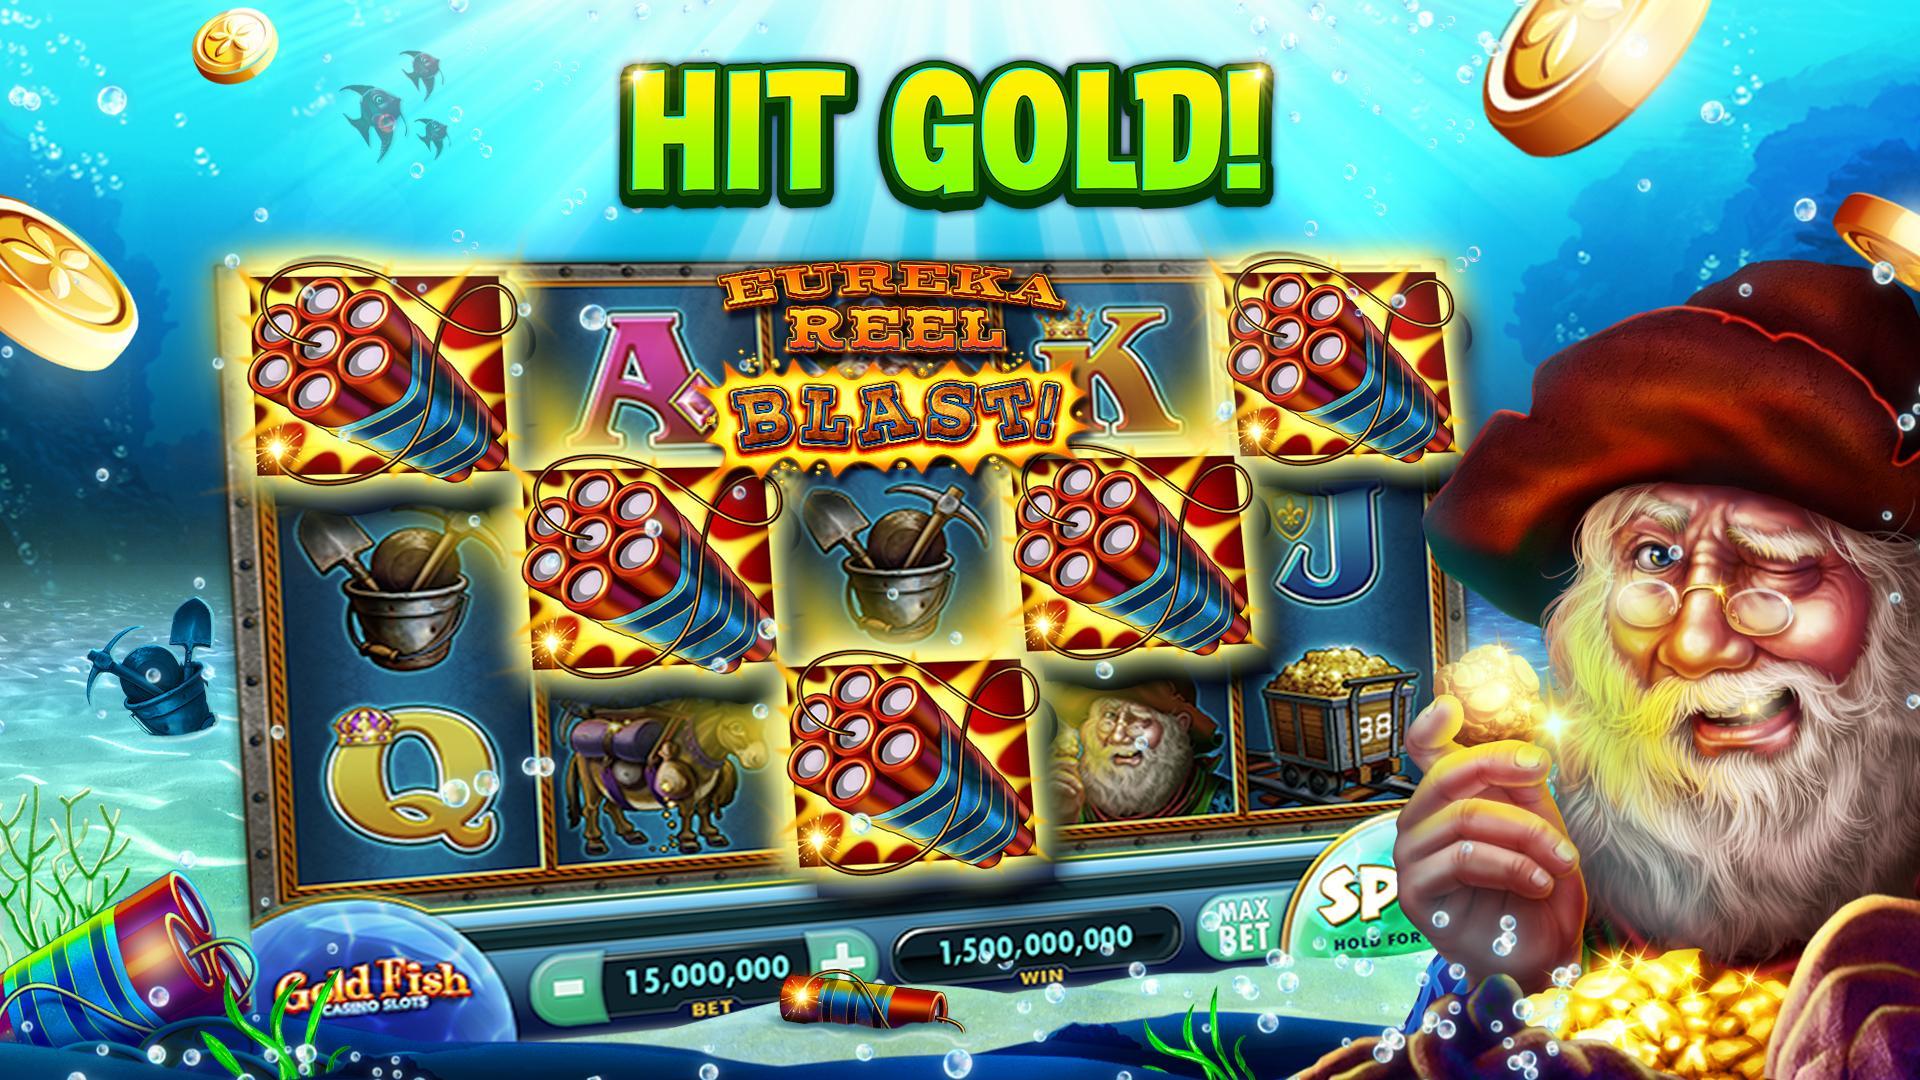 Gold Fish Casino Slots - FREE Slot Machine Games 25.09.00 Screenshot 23